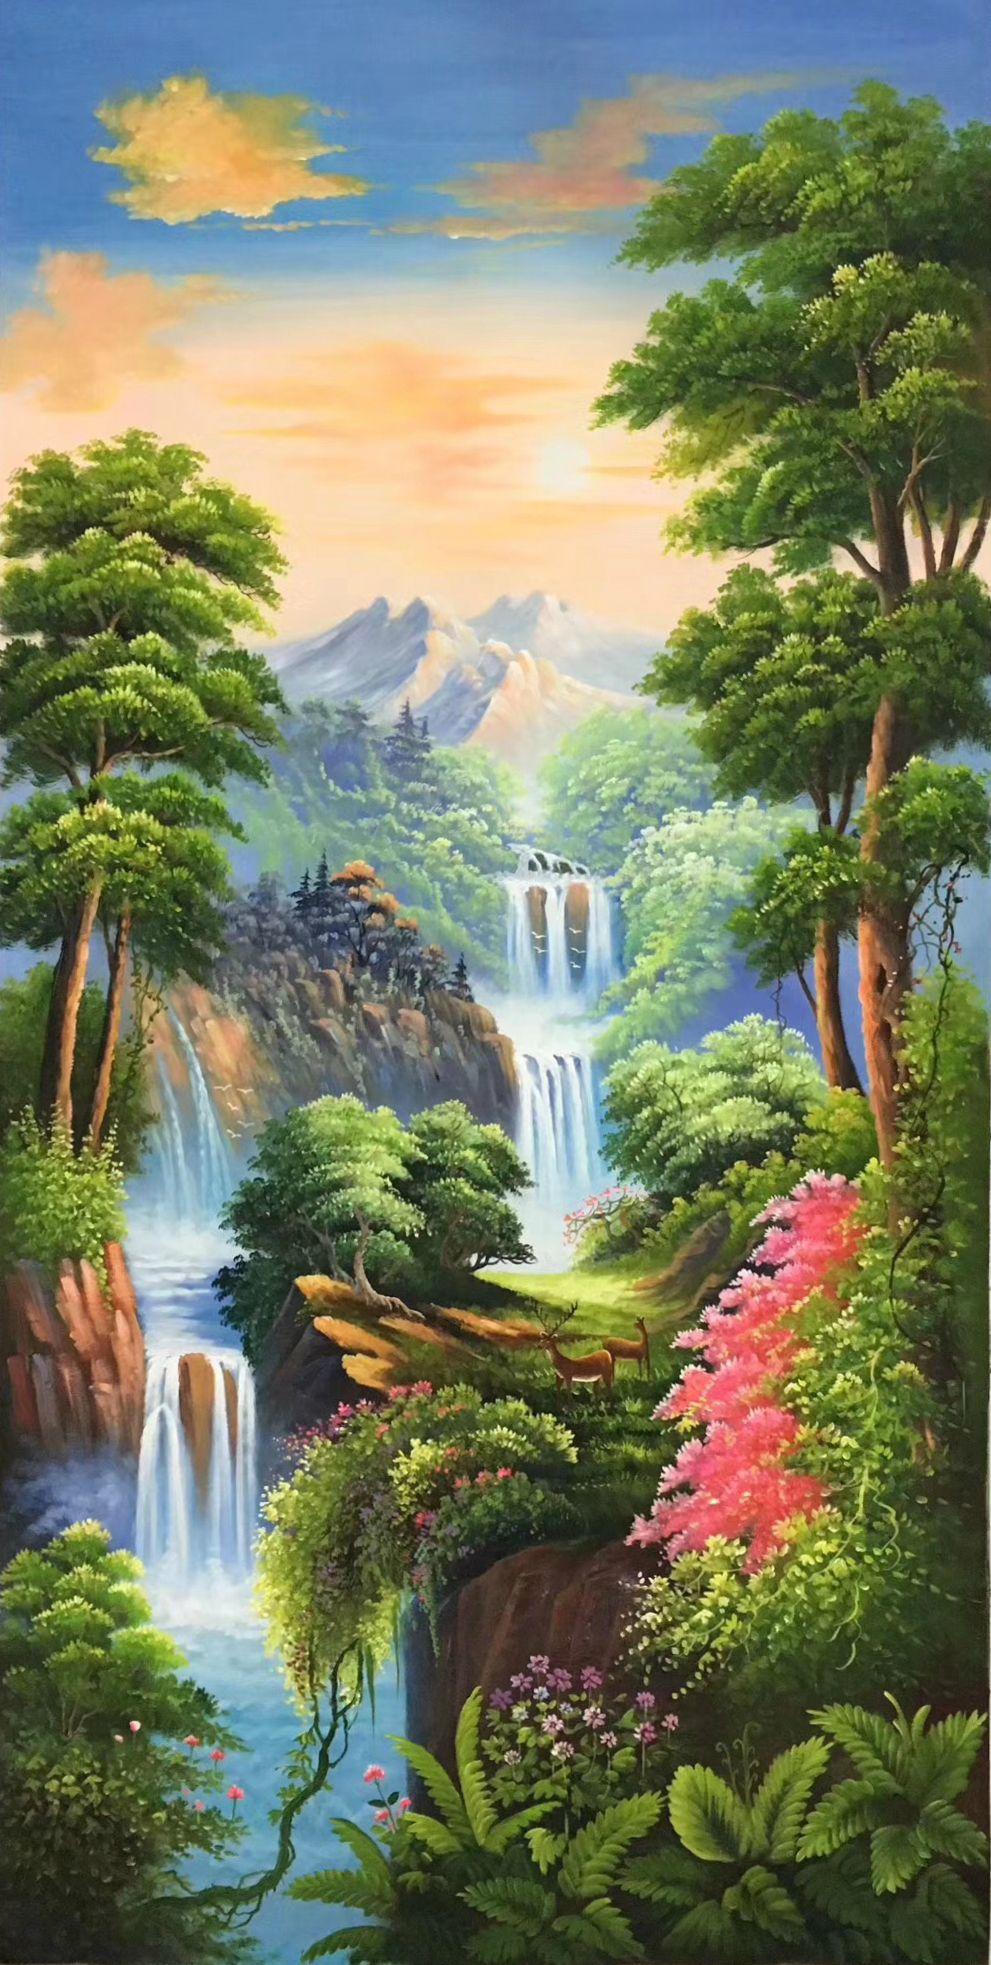 Id 817 Size 80x160cm 30 X72 Inch 100 Hand Made Oil Painting Decoration Murals Art Home Decor Wall De Nature Art Painting Scenery Paintings Nature Paintings